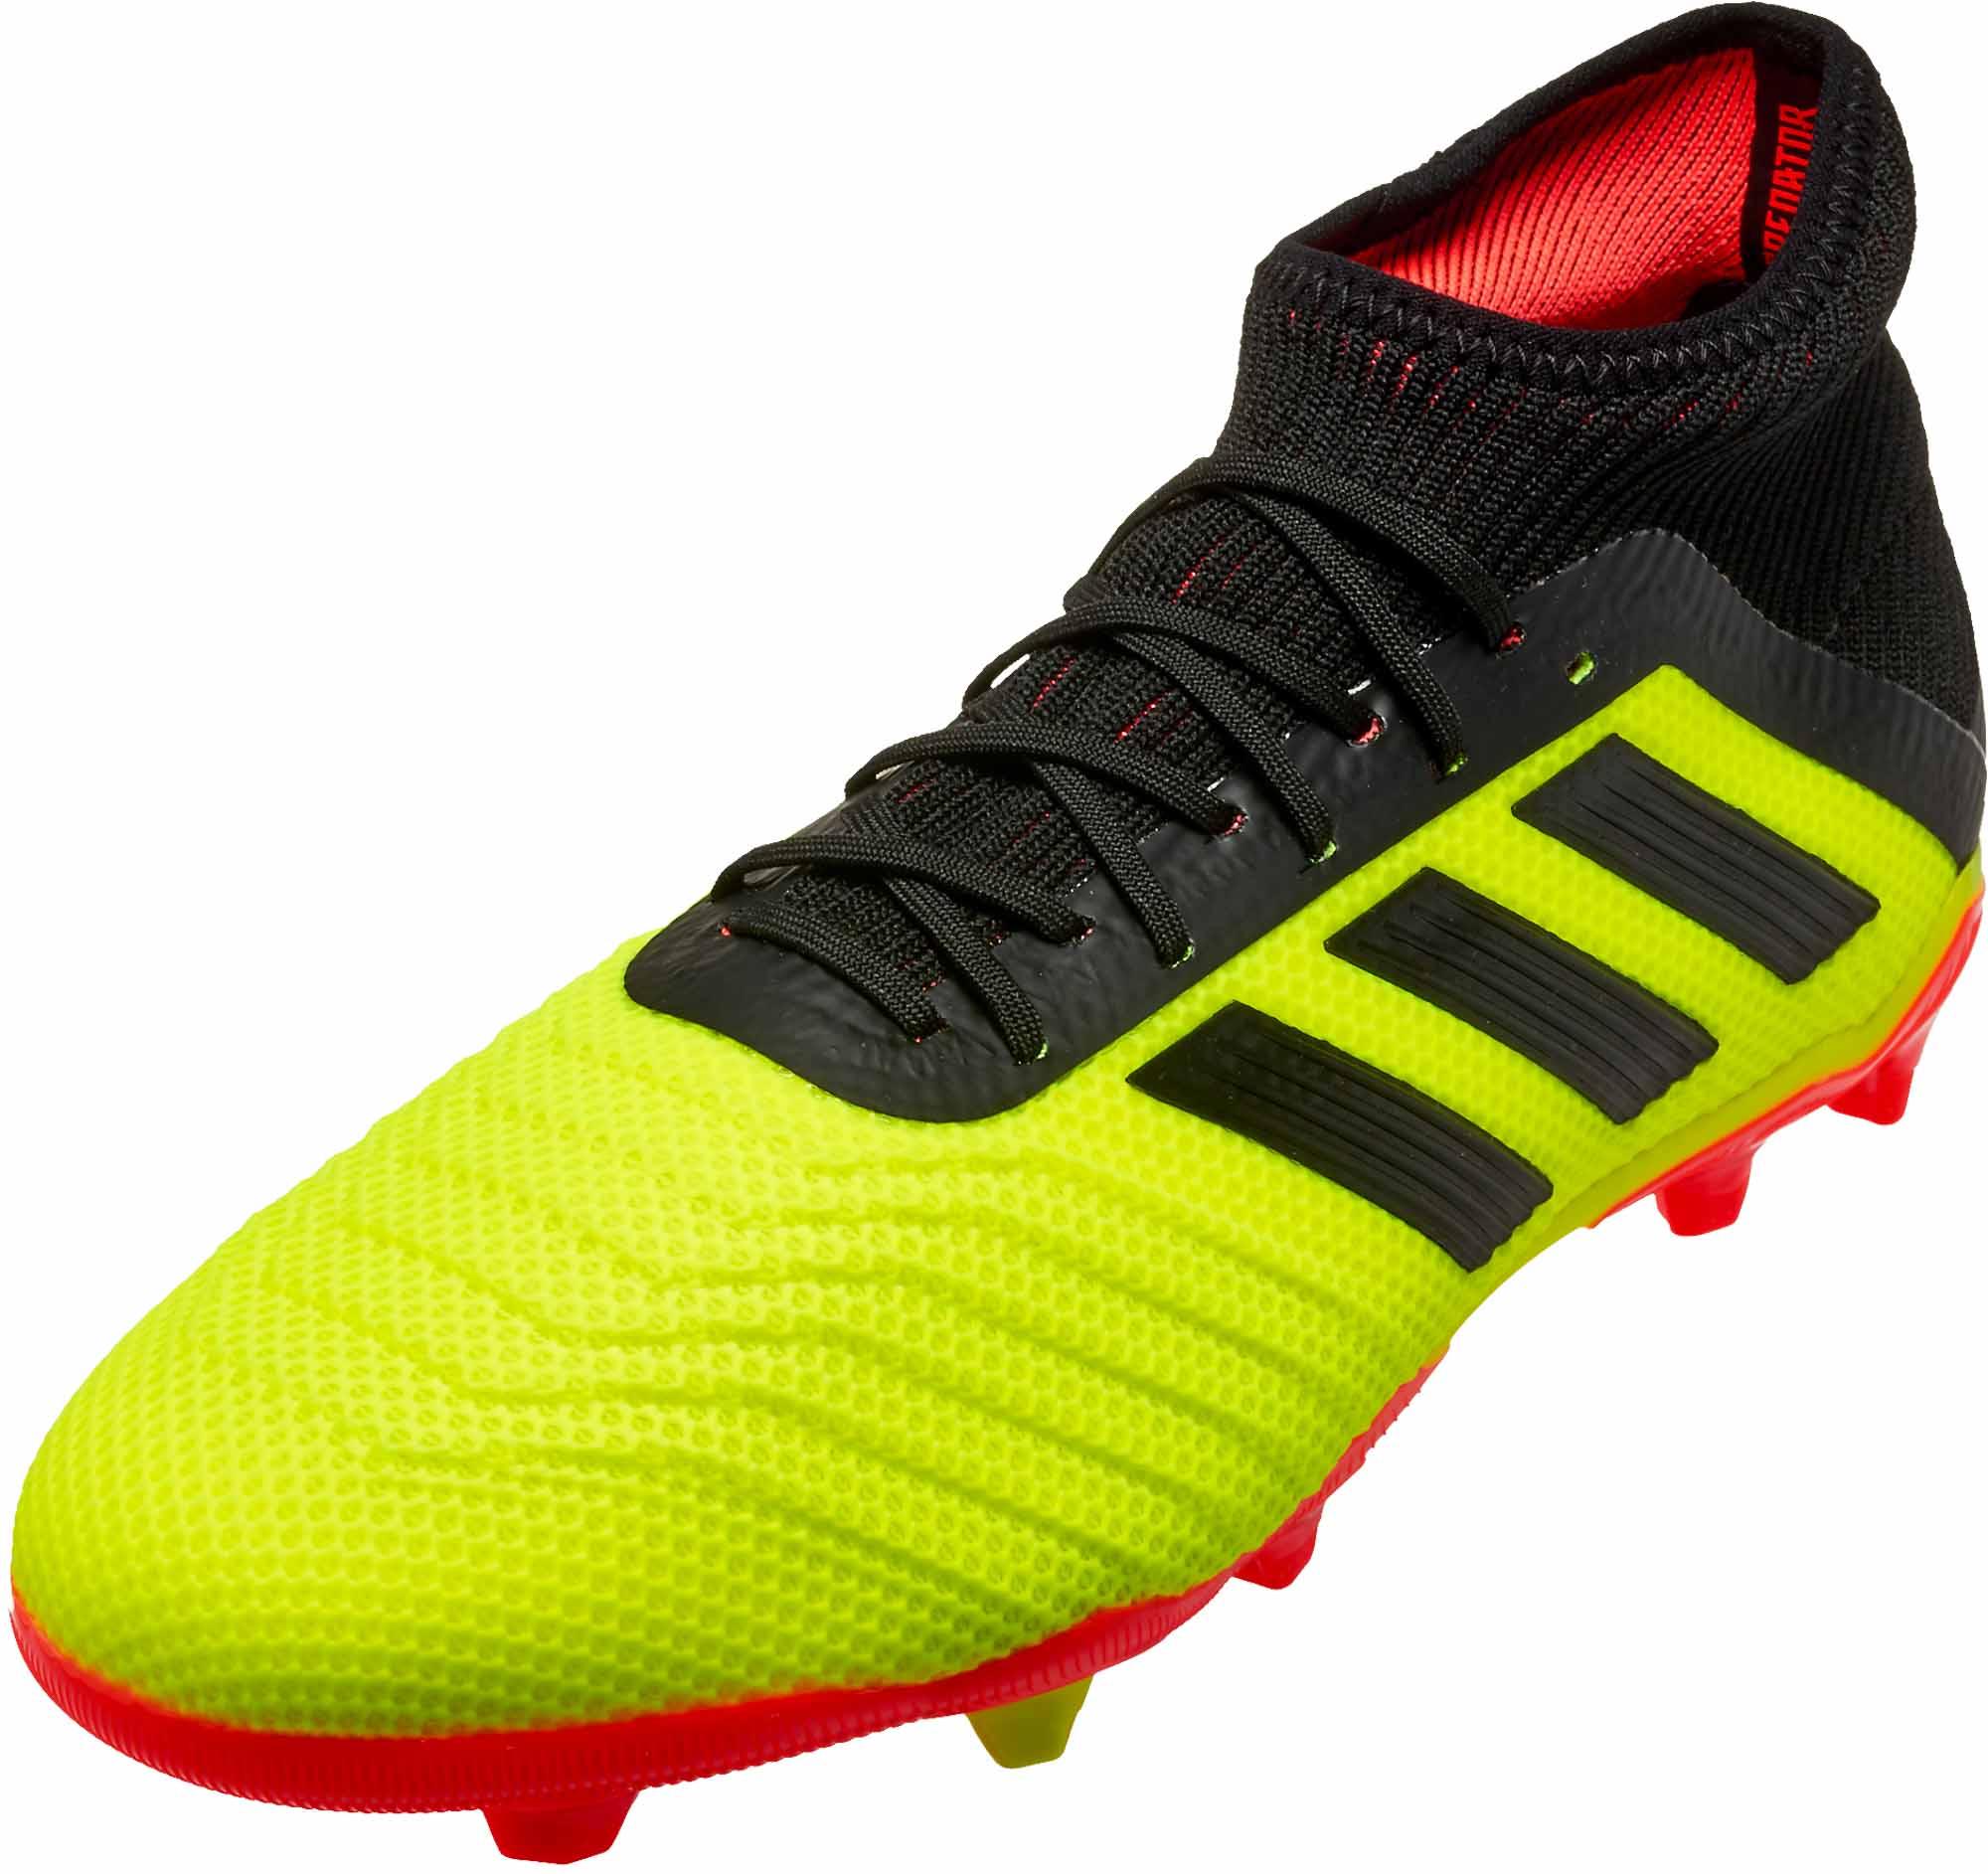 cd910432b3ab Kids adidas Predator 18.1 FG - Energy Mode - SoccerPro